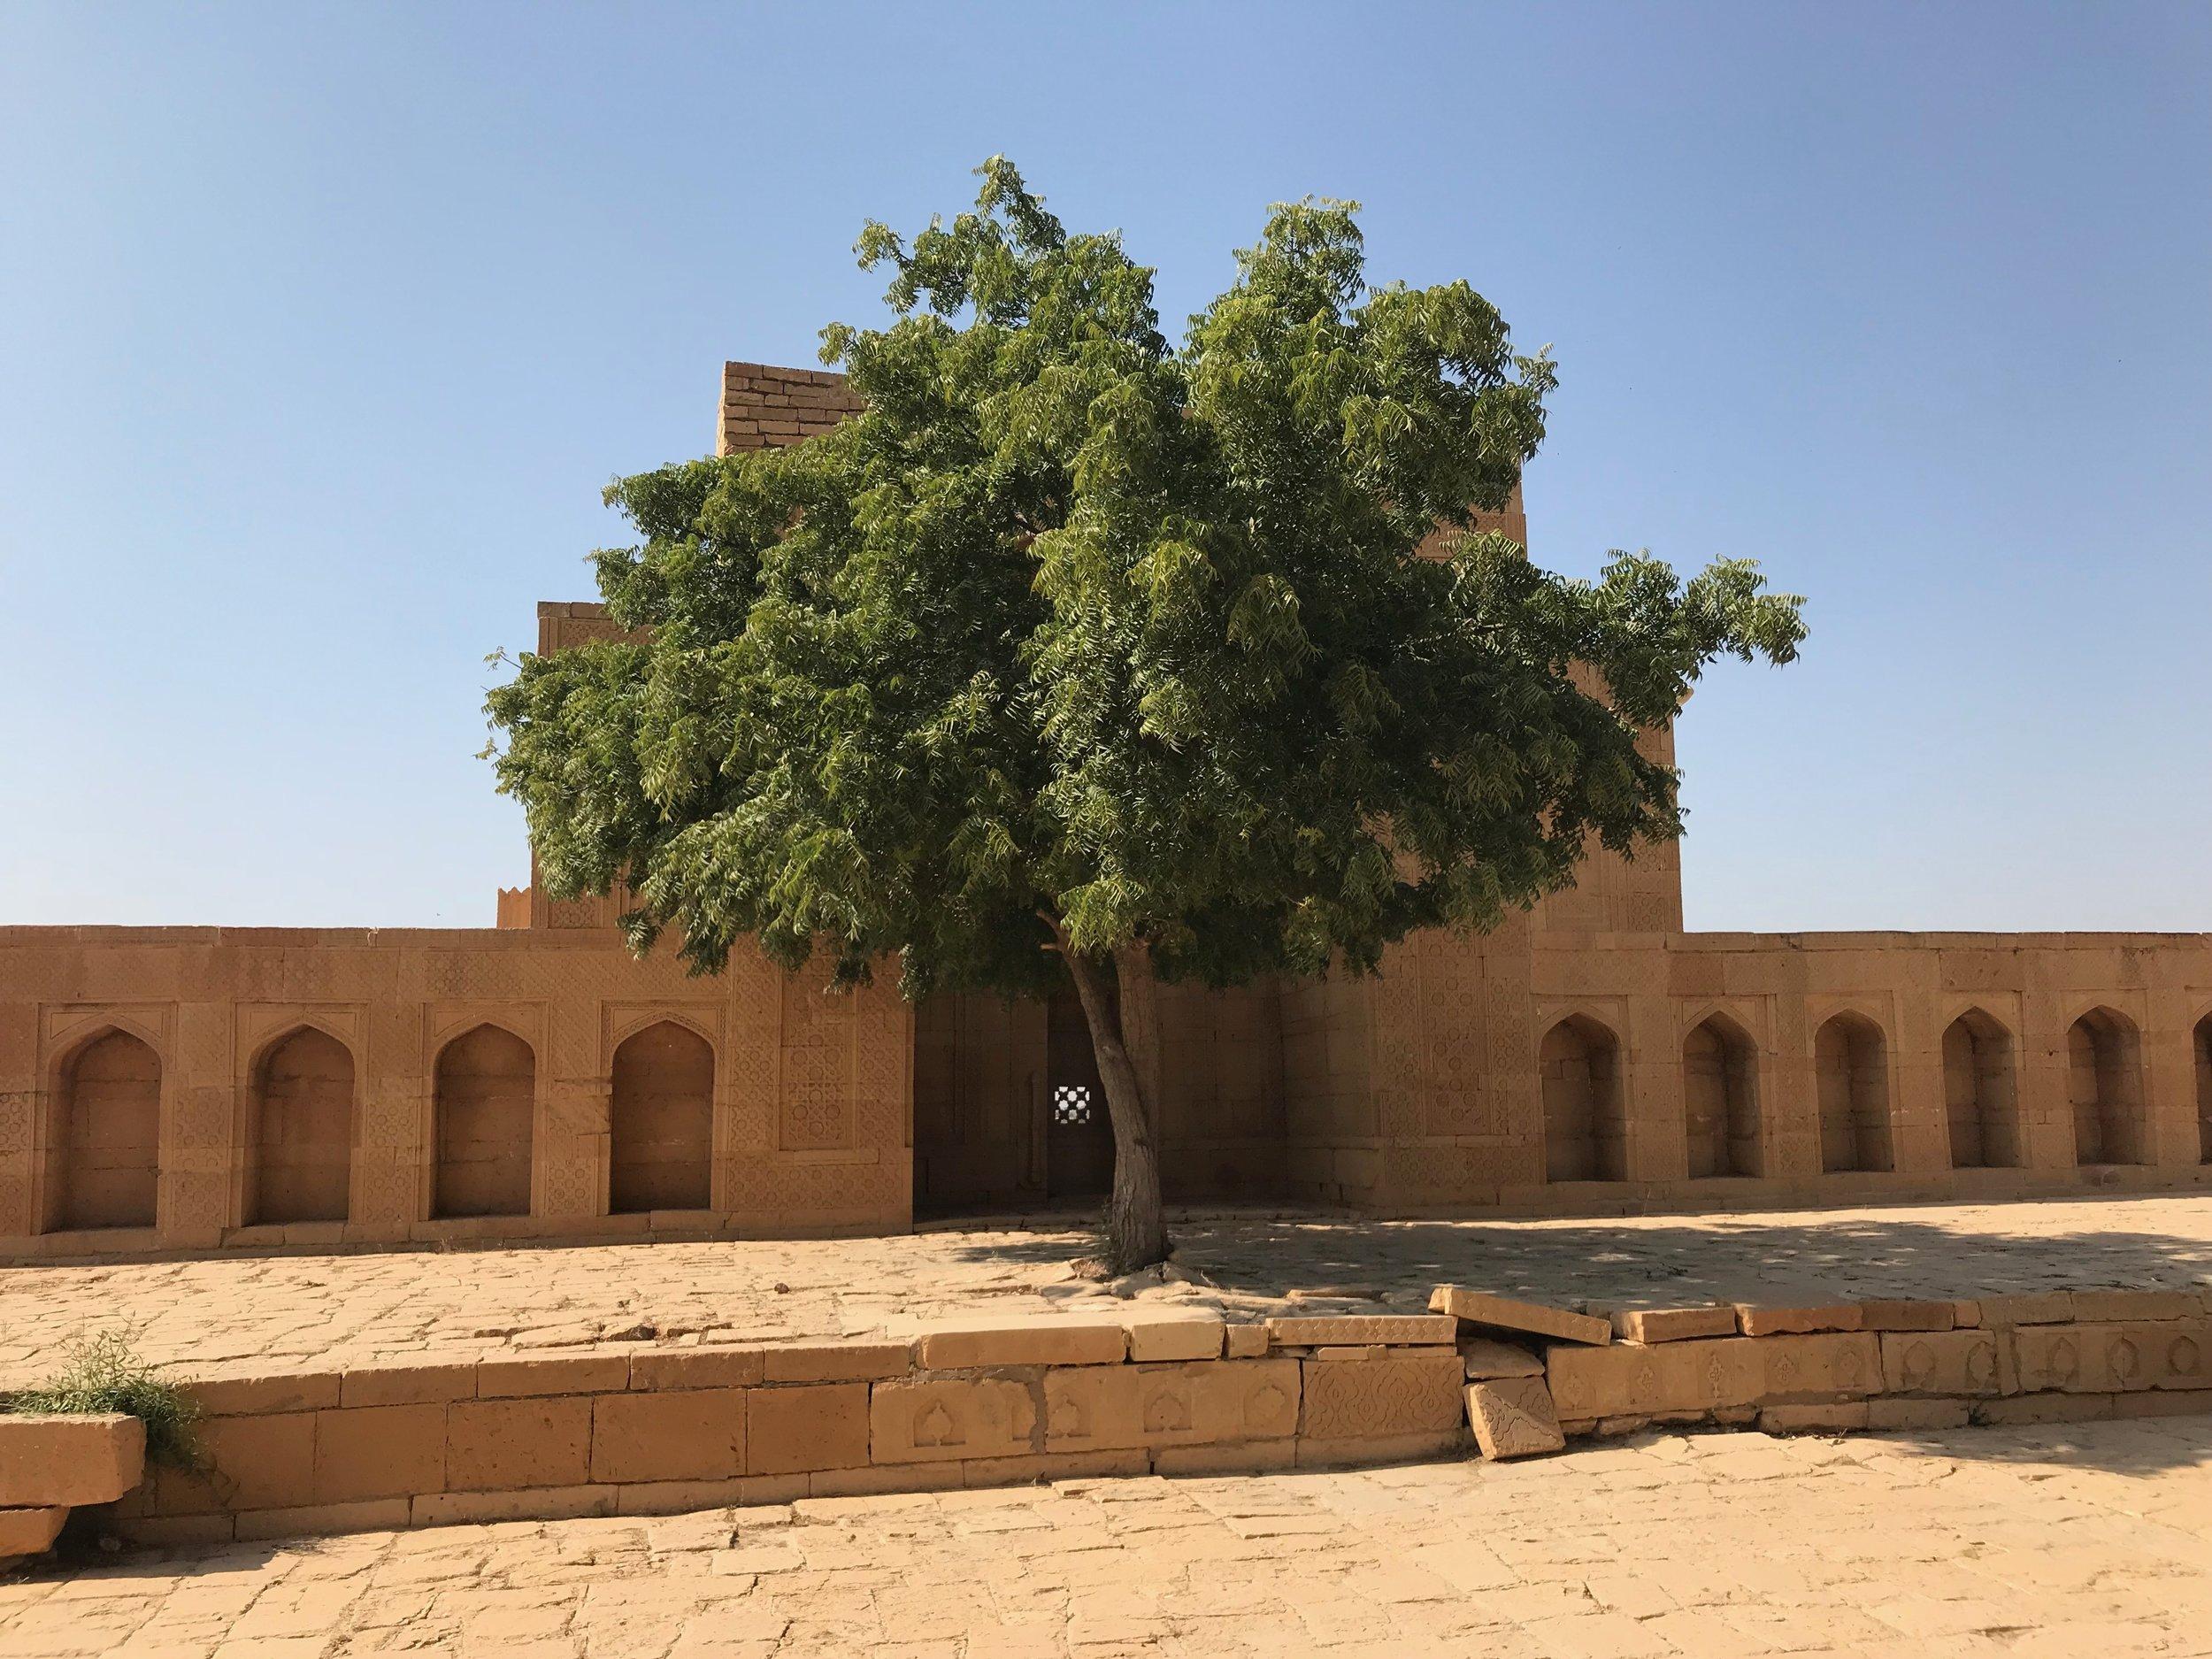 Photo credit: Makli World Heritage Site @ Siavash Laghai